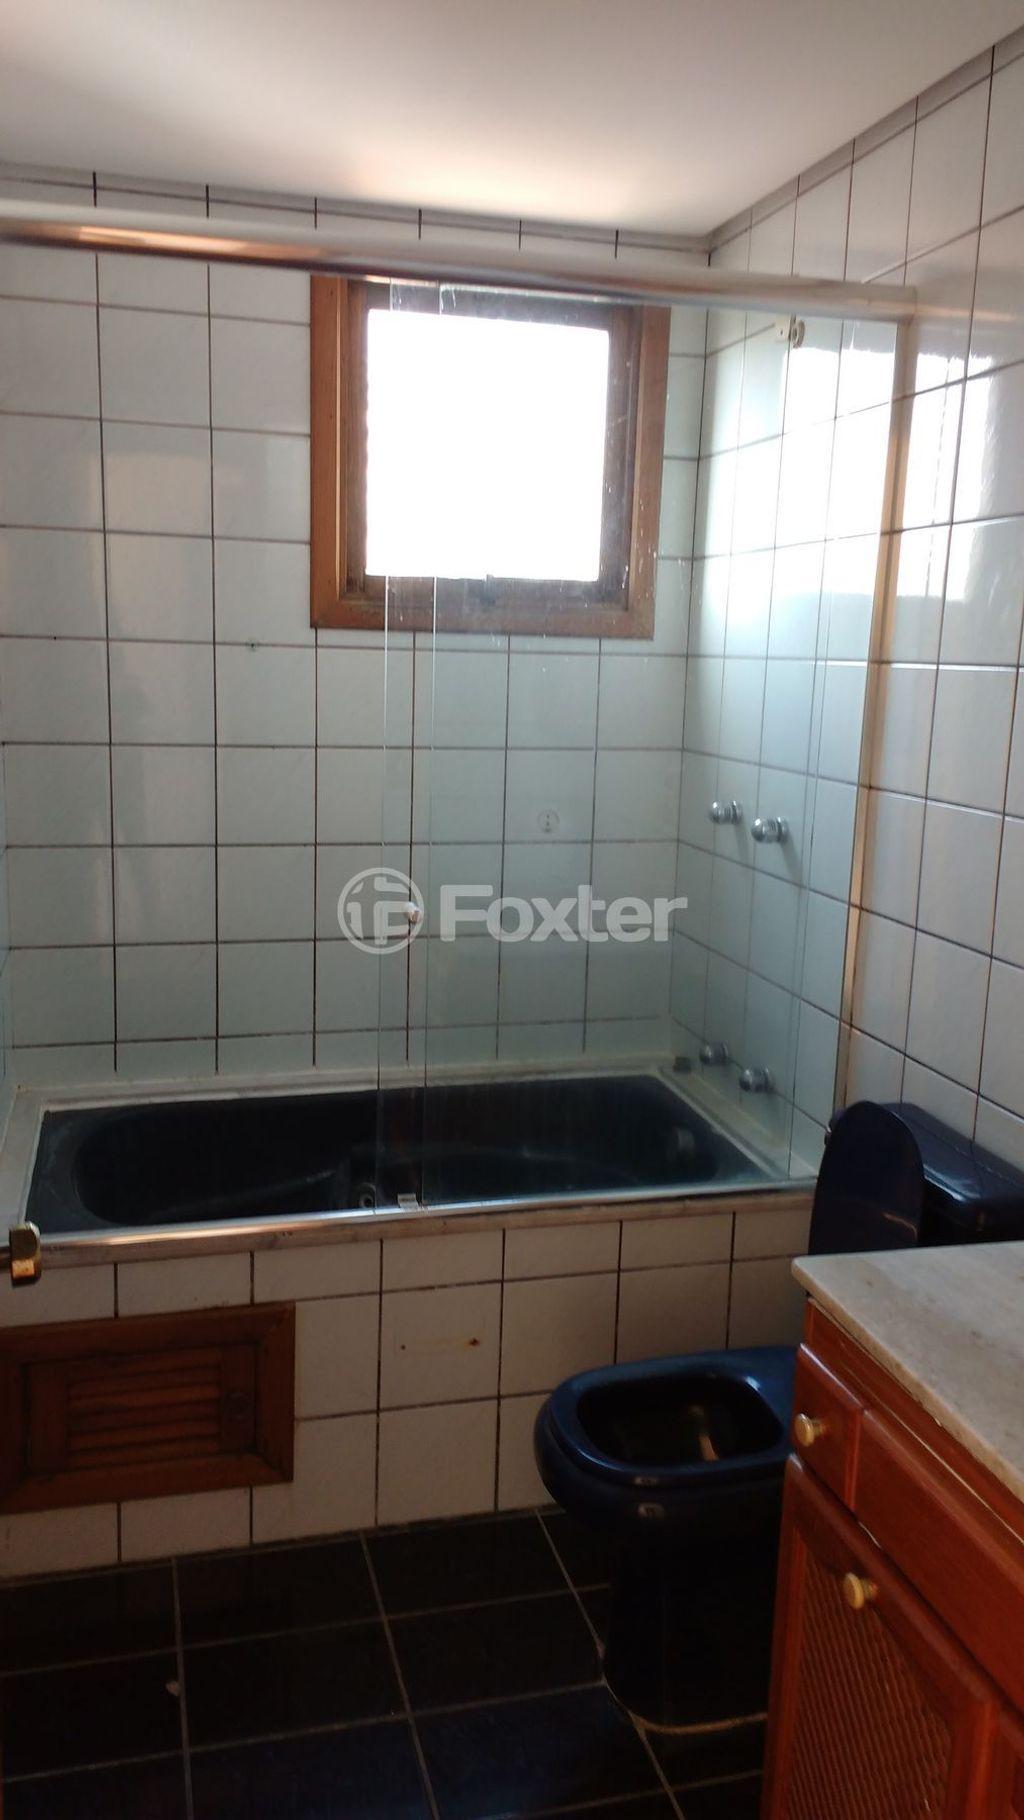 Cobertura 3 Dorm, Tristeza, Porto Alegre (139933) - Foto 4